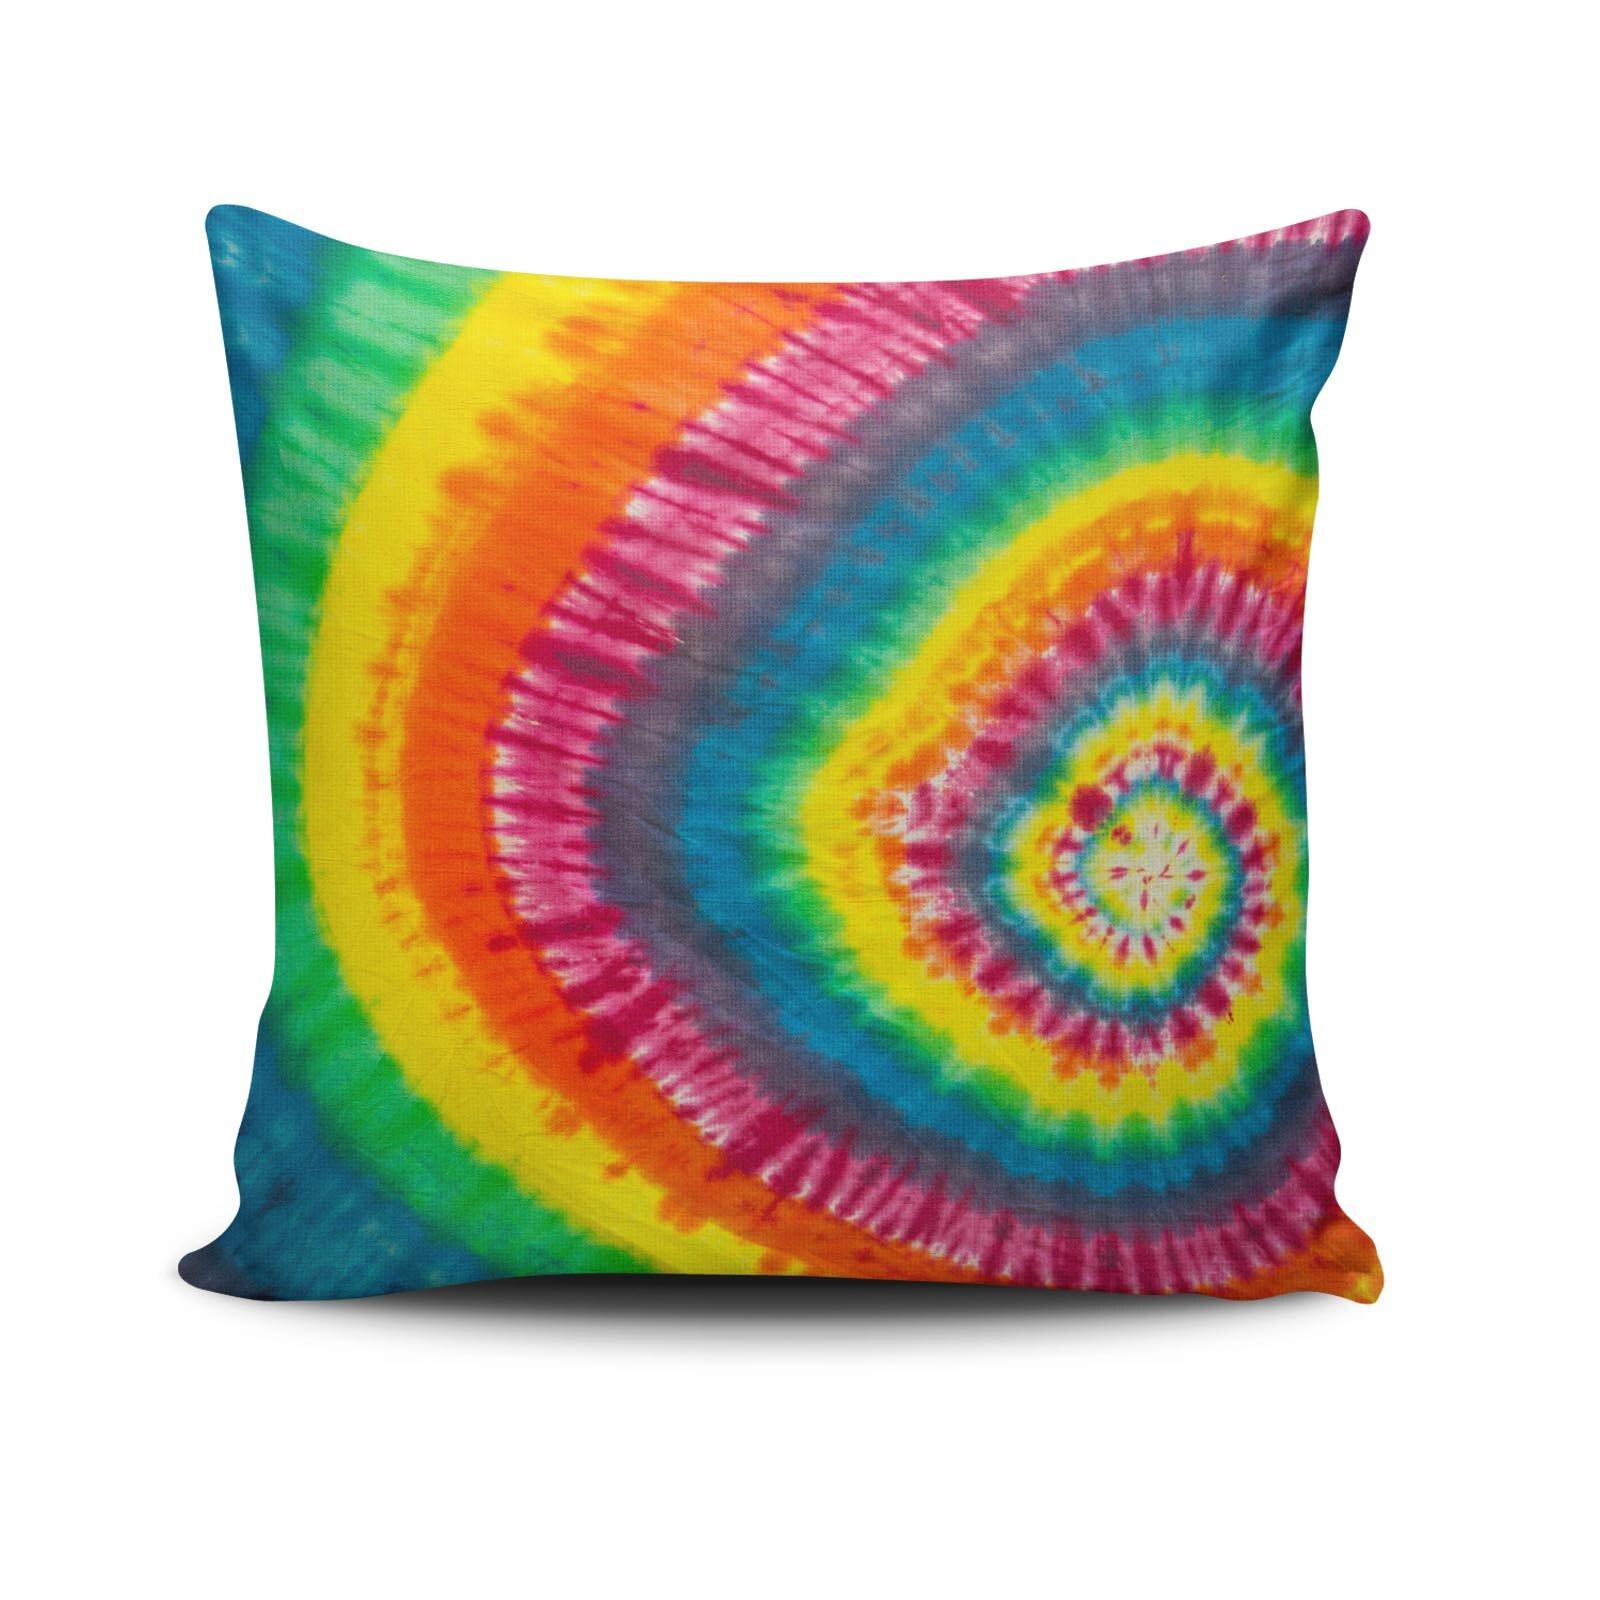 Perna decorativa Cushion Love, Dimensiune: 45 x 45 cm, Material exterior: 50% bumbac / 50% poliester 768CLV0128